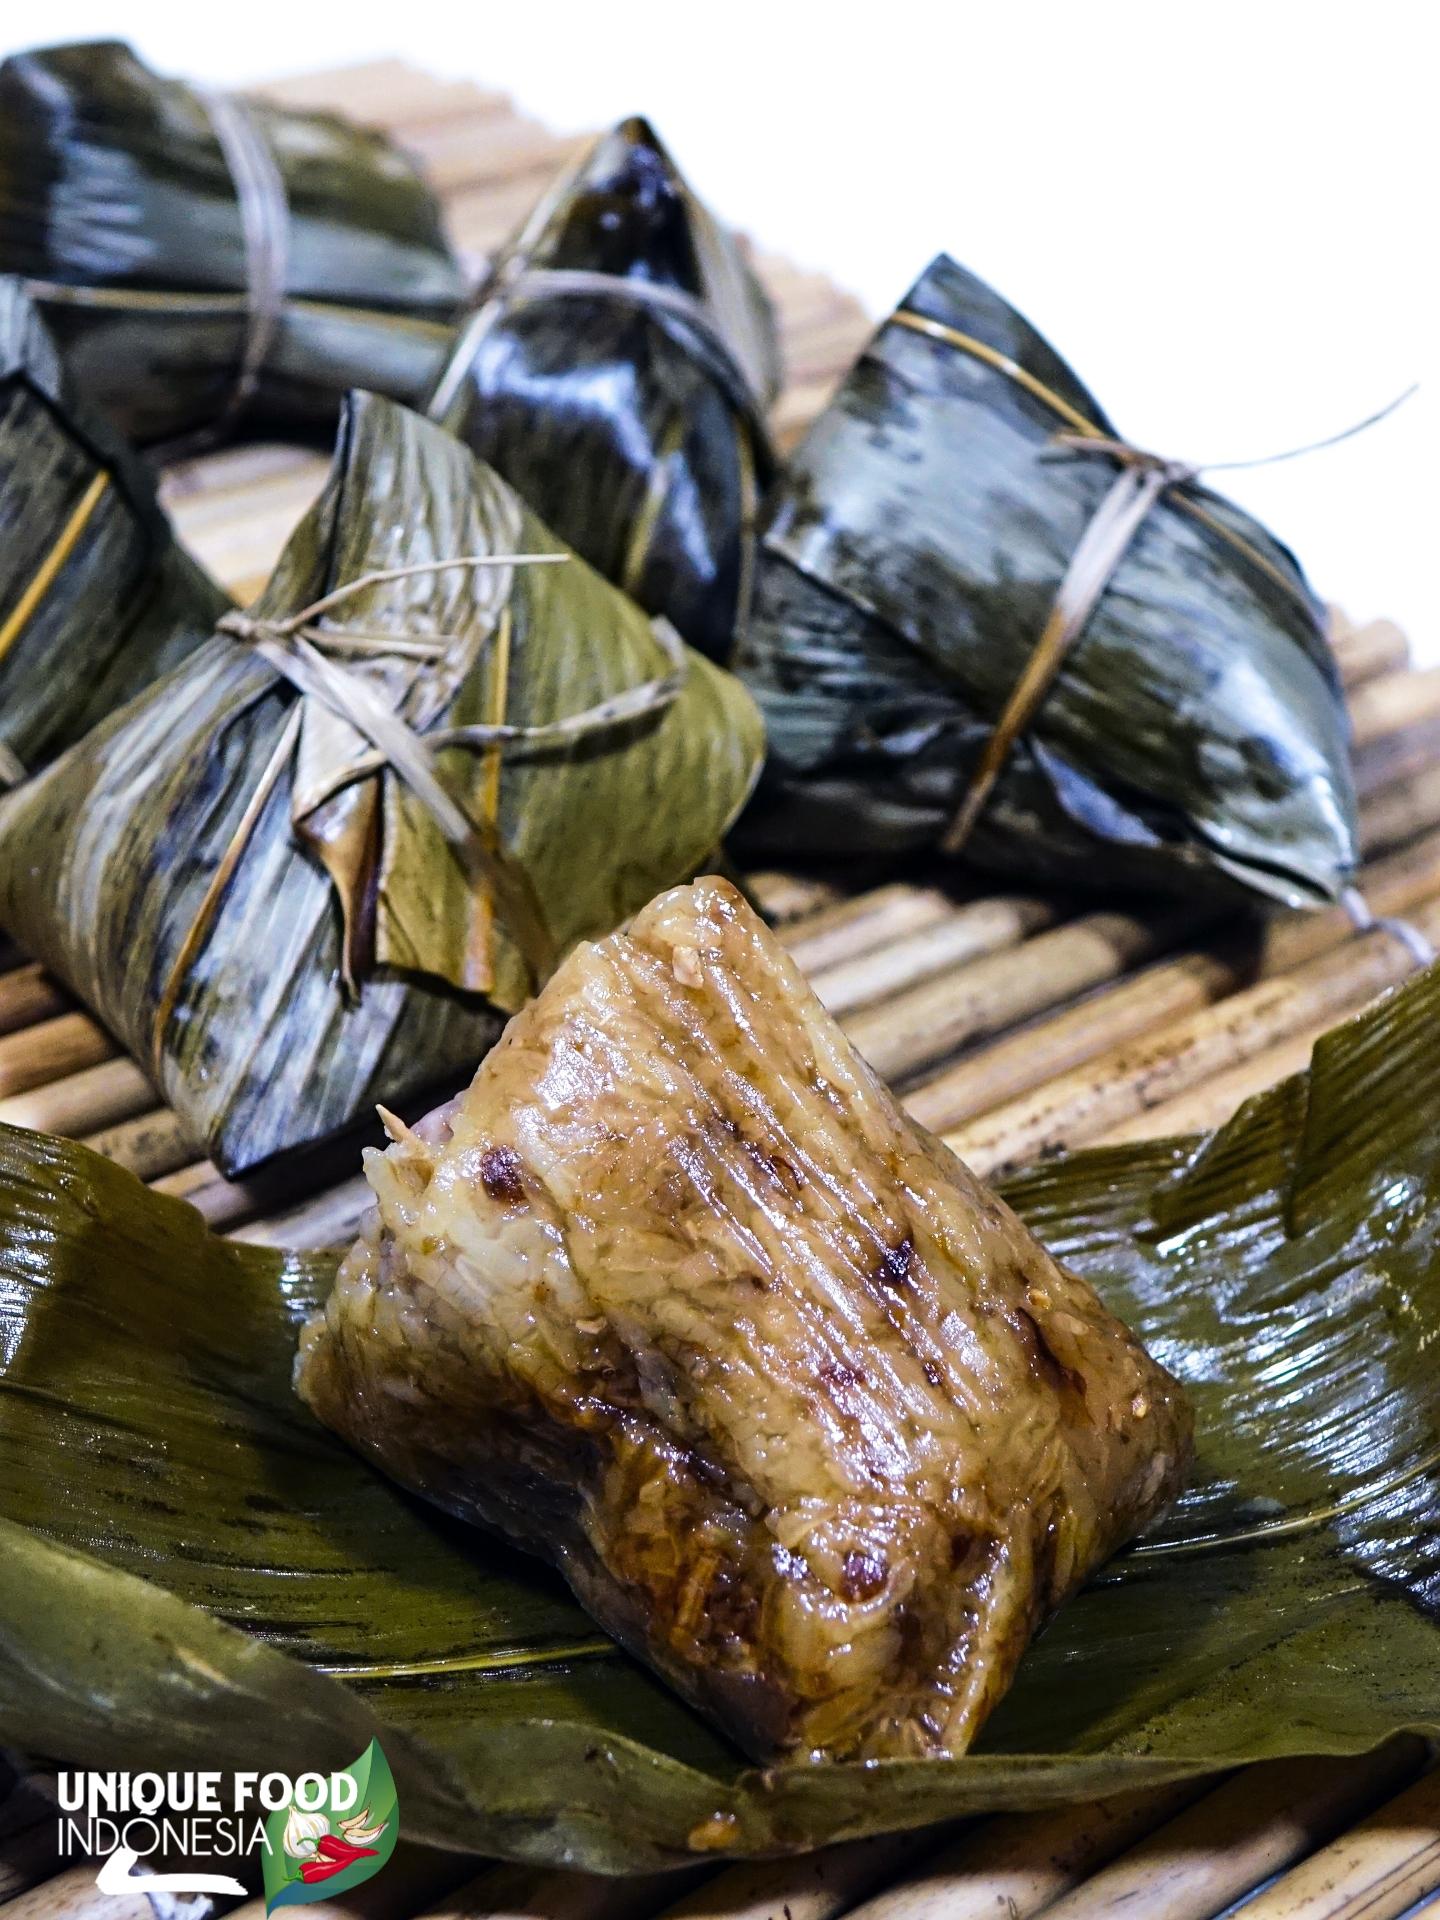 Botok Tawon The Unique Food And Delicious Wasp Larvae Unique Food Indonesia